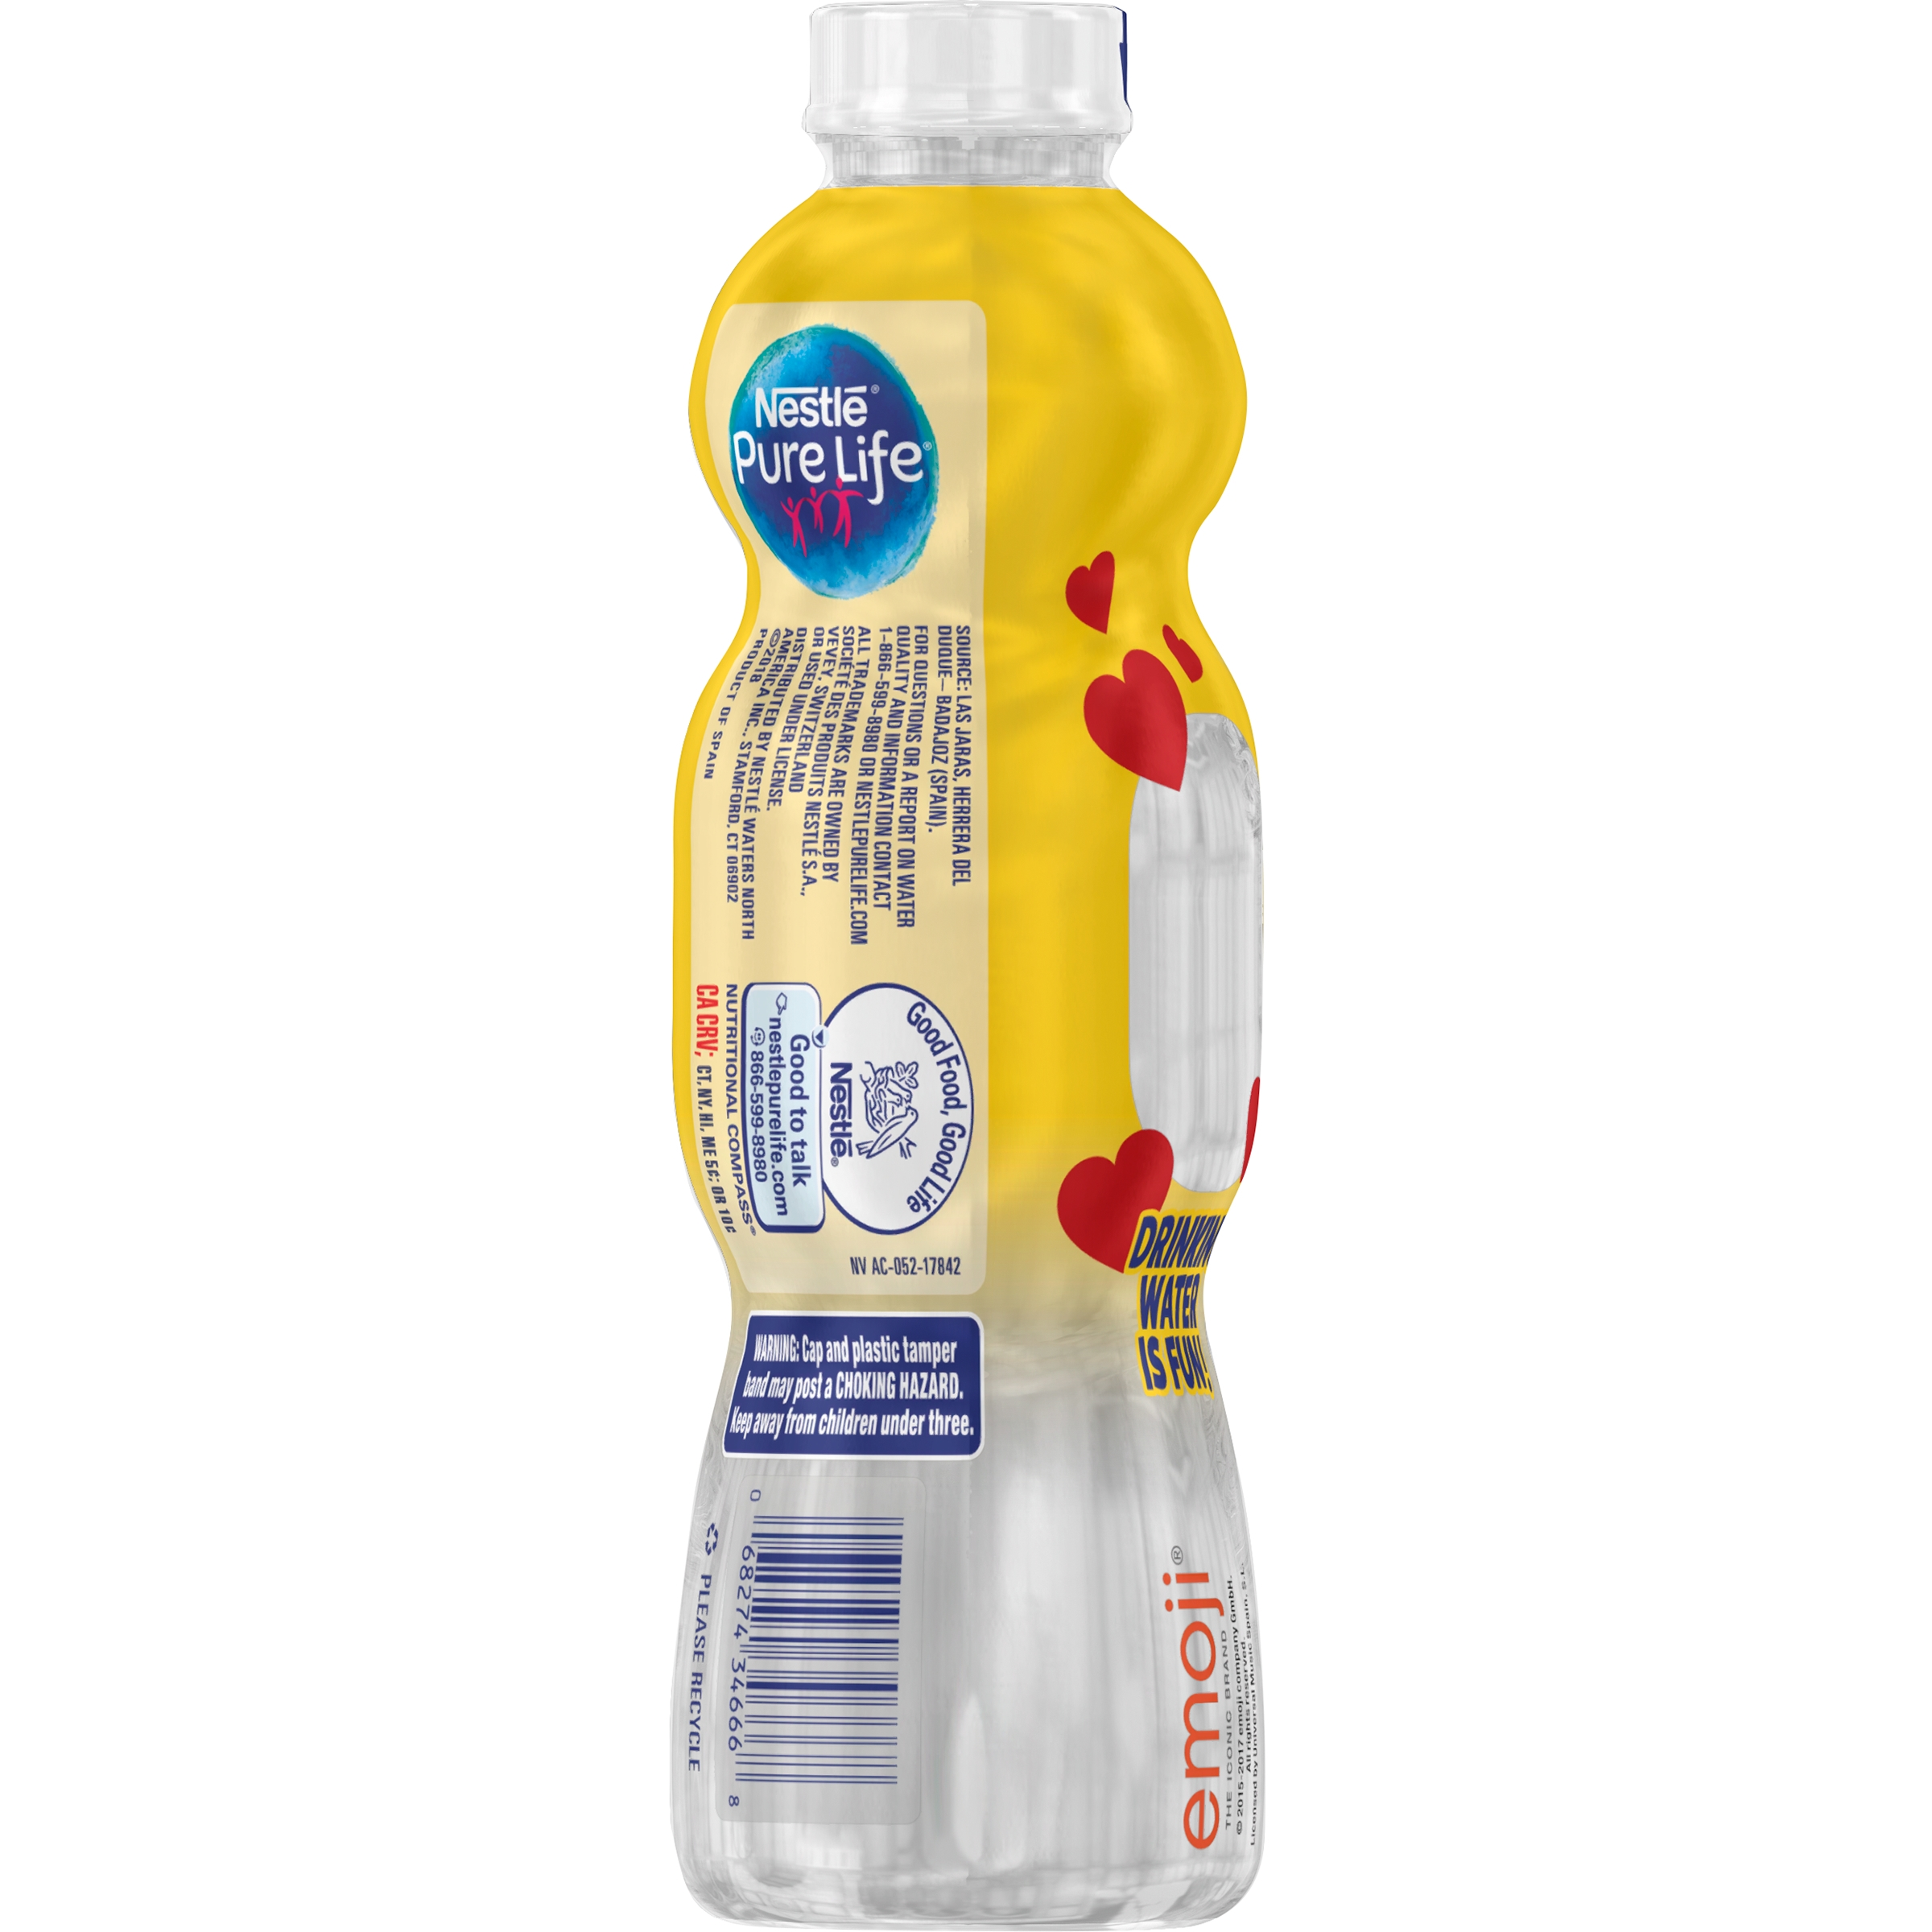 NESTLÉ Pure Life Emoji Drinking Water 11 2 fl  oz  Bottle - Walmart com